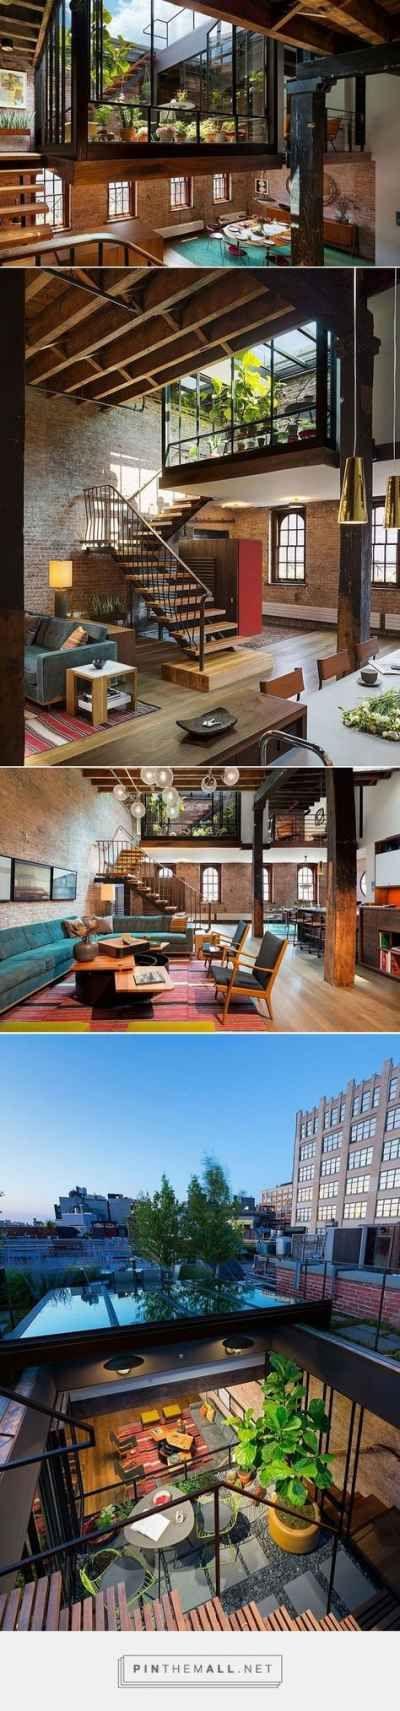 feelitcool.com wp-content uploads 2017 03 loft-interior-designs5.jpg